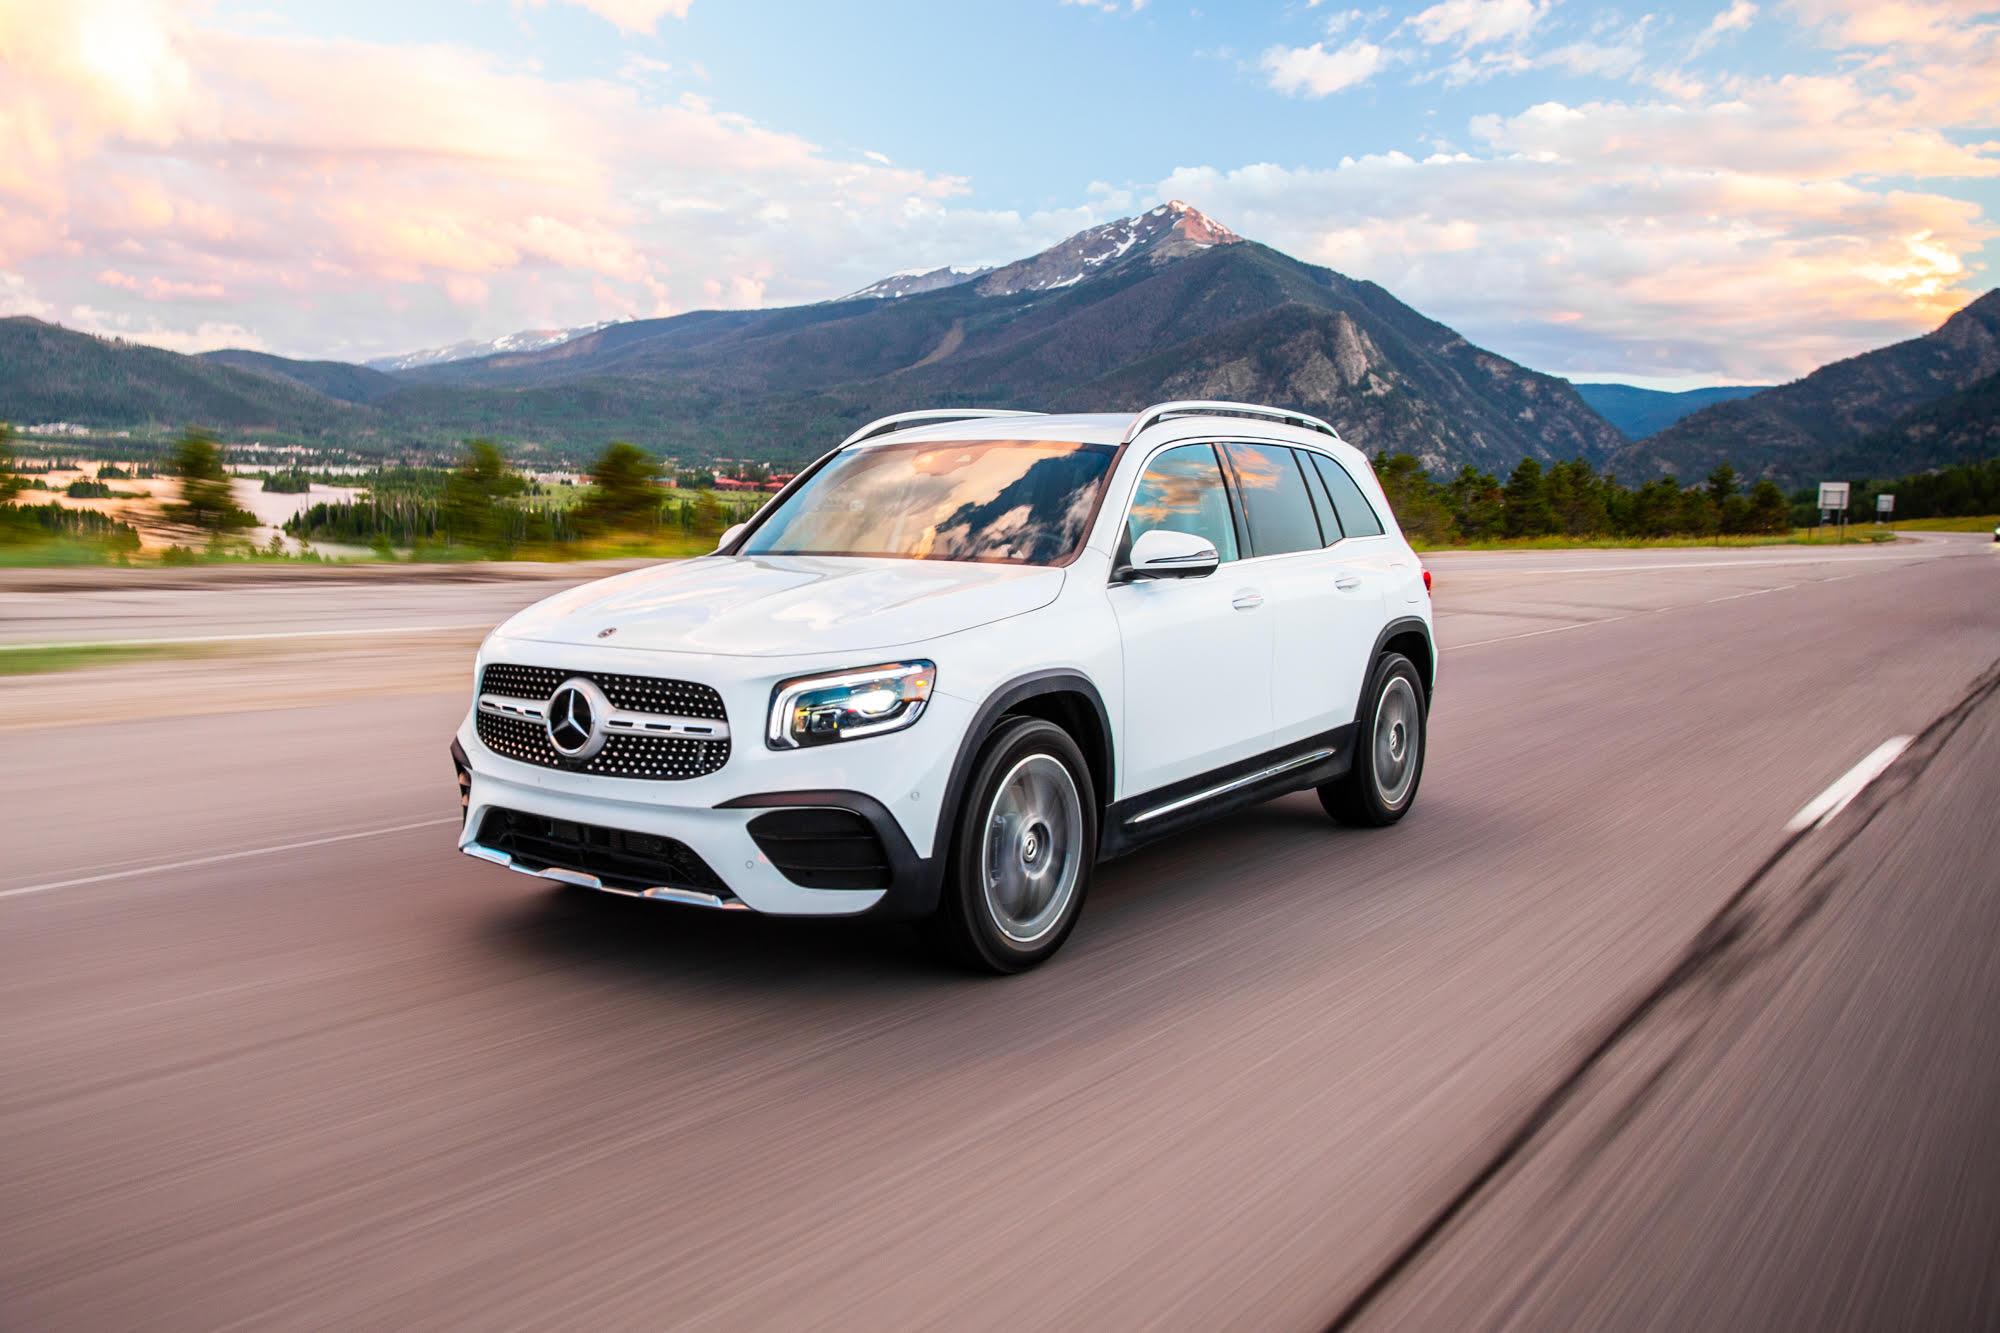 2020 Mercedes Benz Glb Suv Review A Fun Futuristic Family Car Fatherly